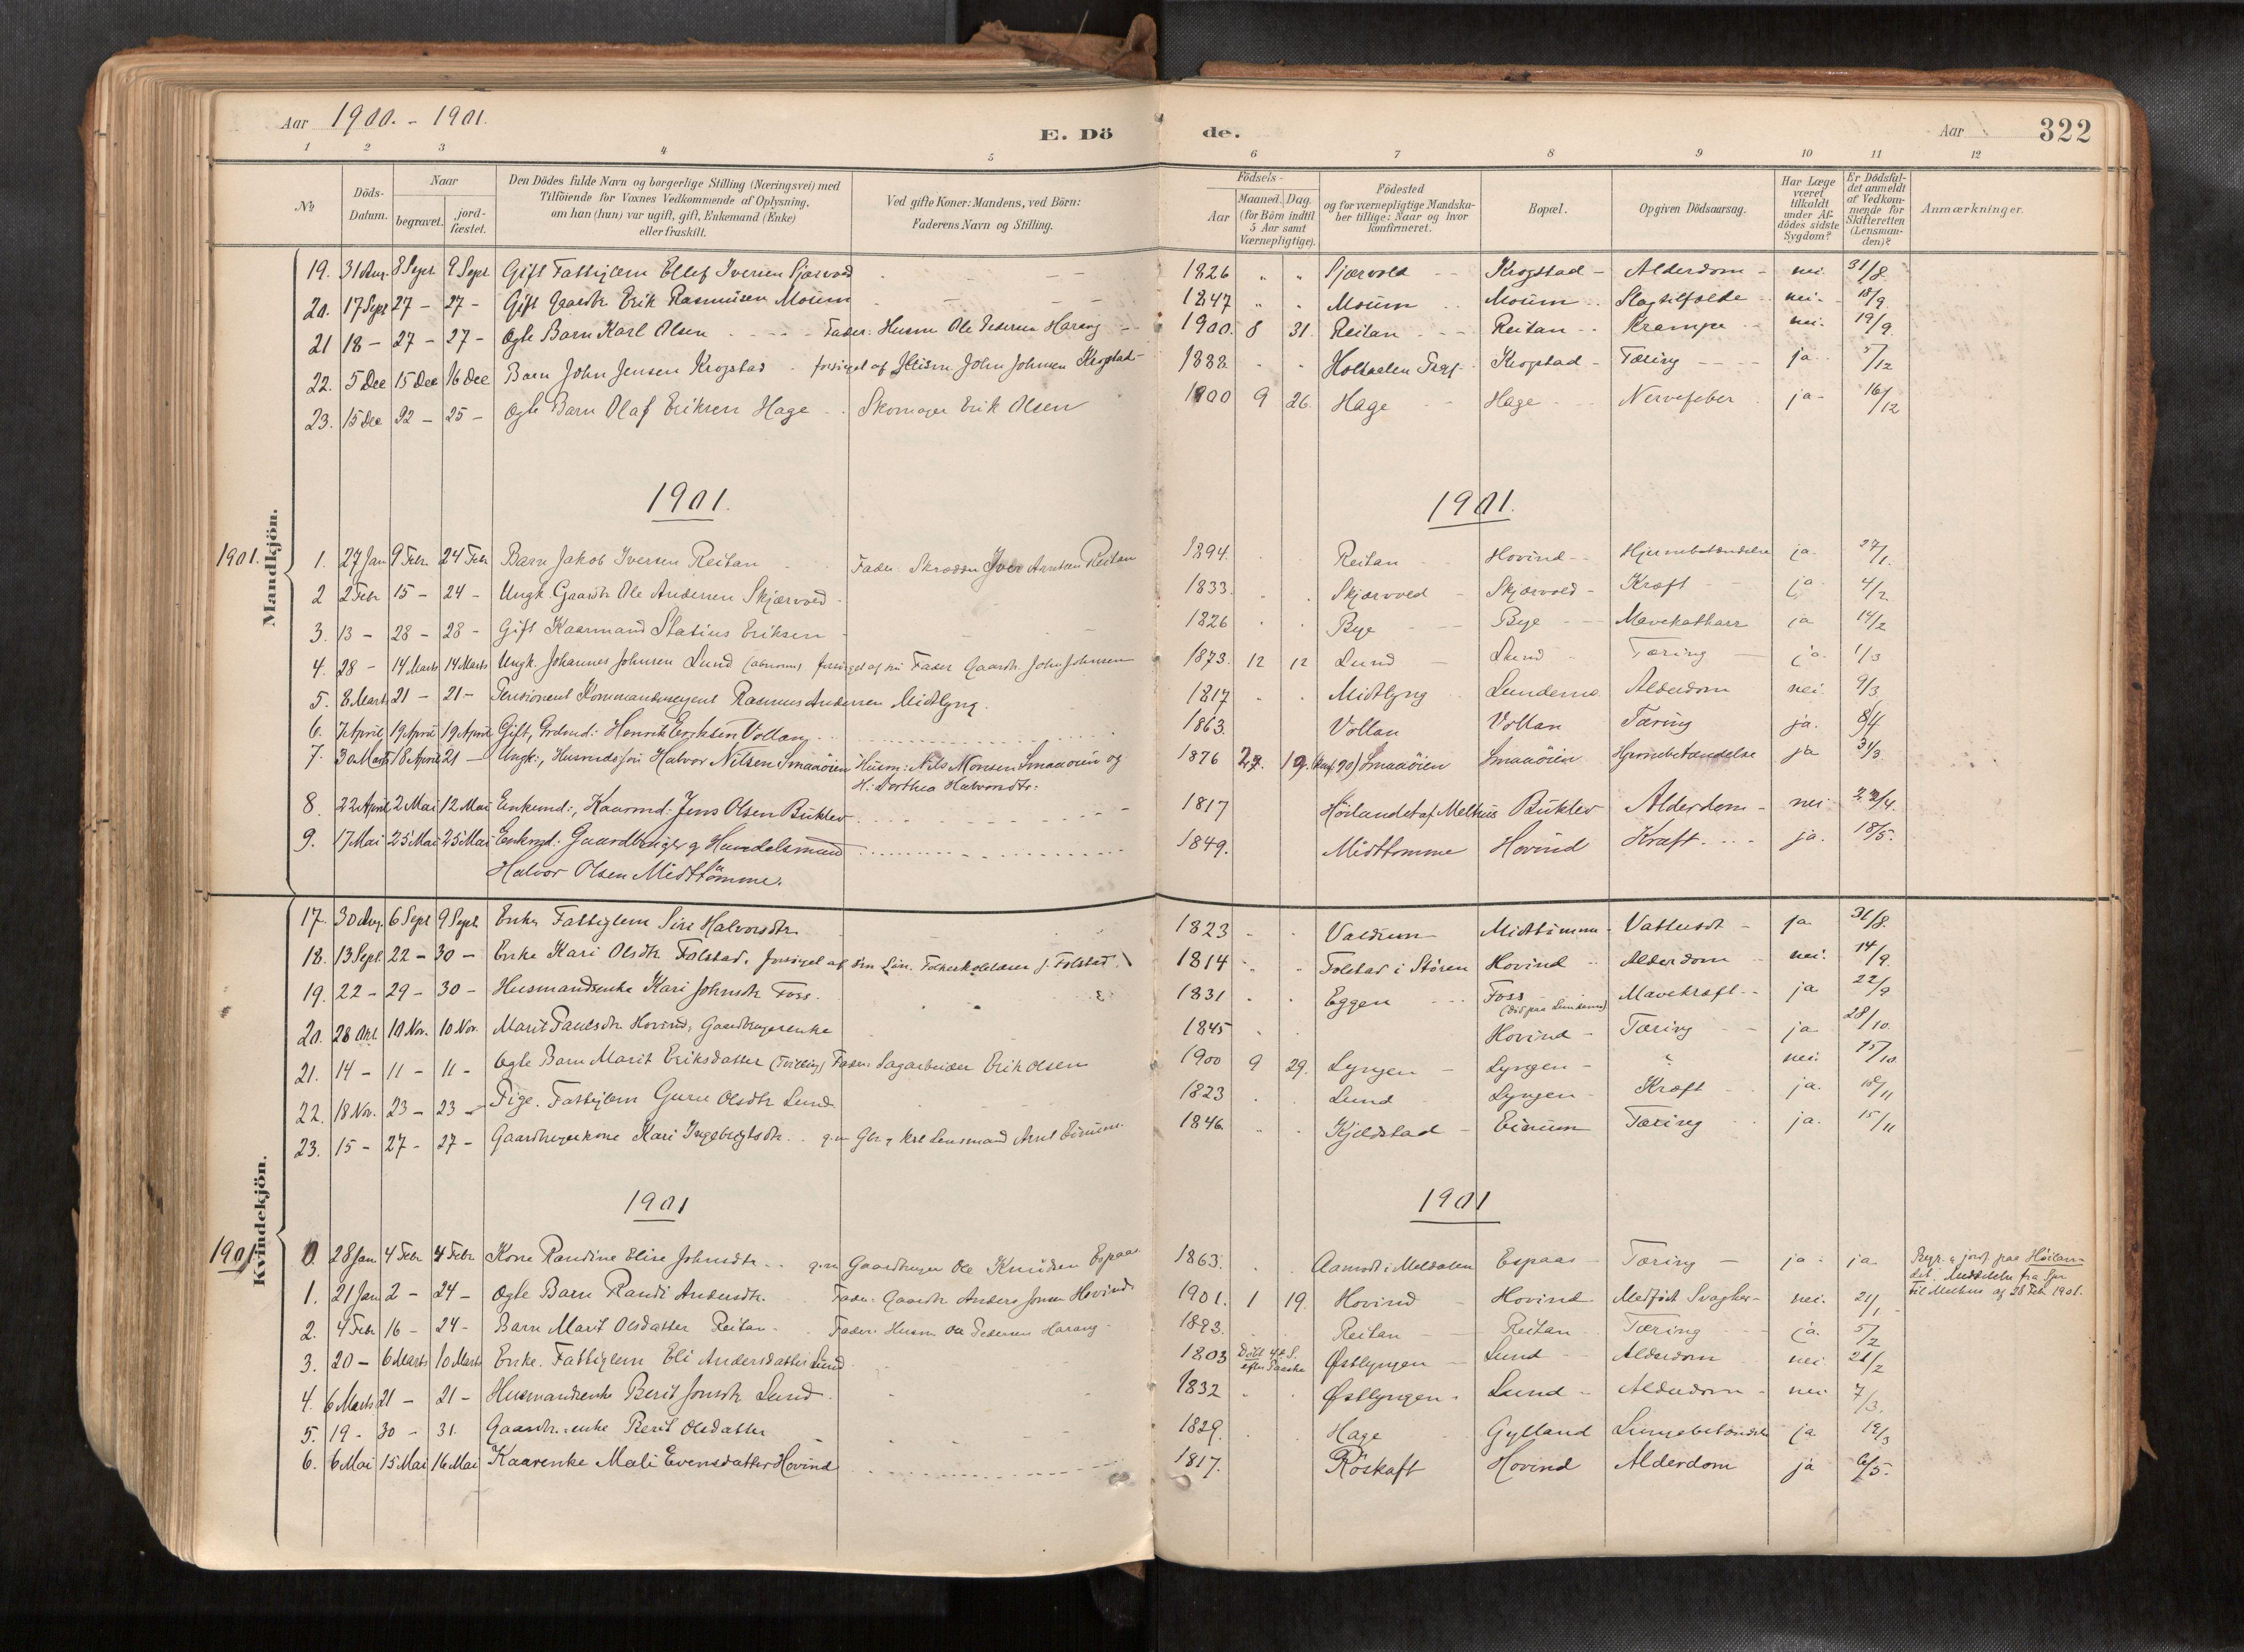 SAT, Ministerialprotokoller, klokkerbøker og fødselsregistre - Sør-Trøndelag, 692/L1105b: Parish register (official) no. 692A06, 1891-1934, p. 322